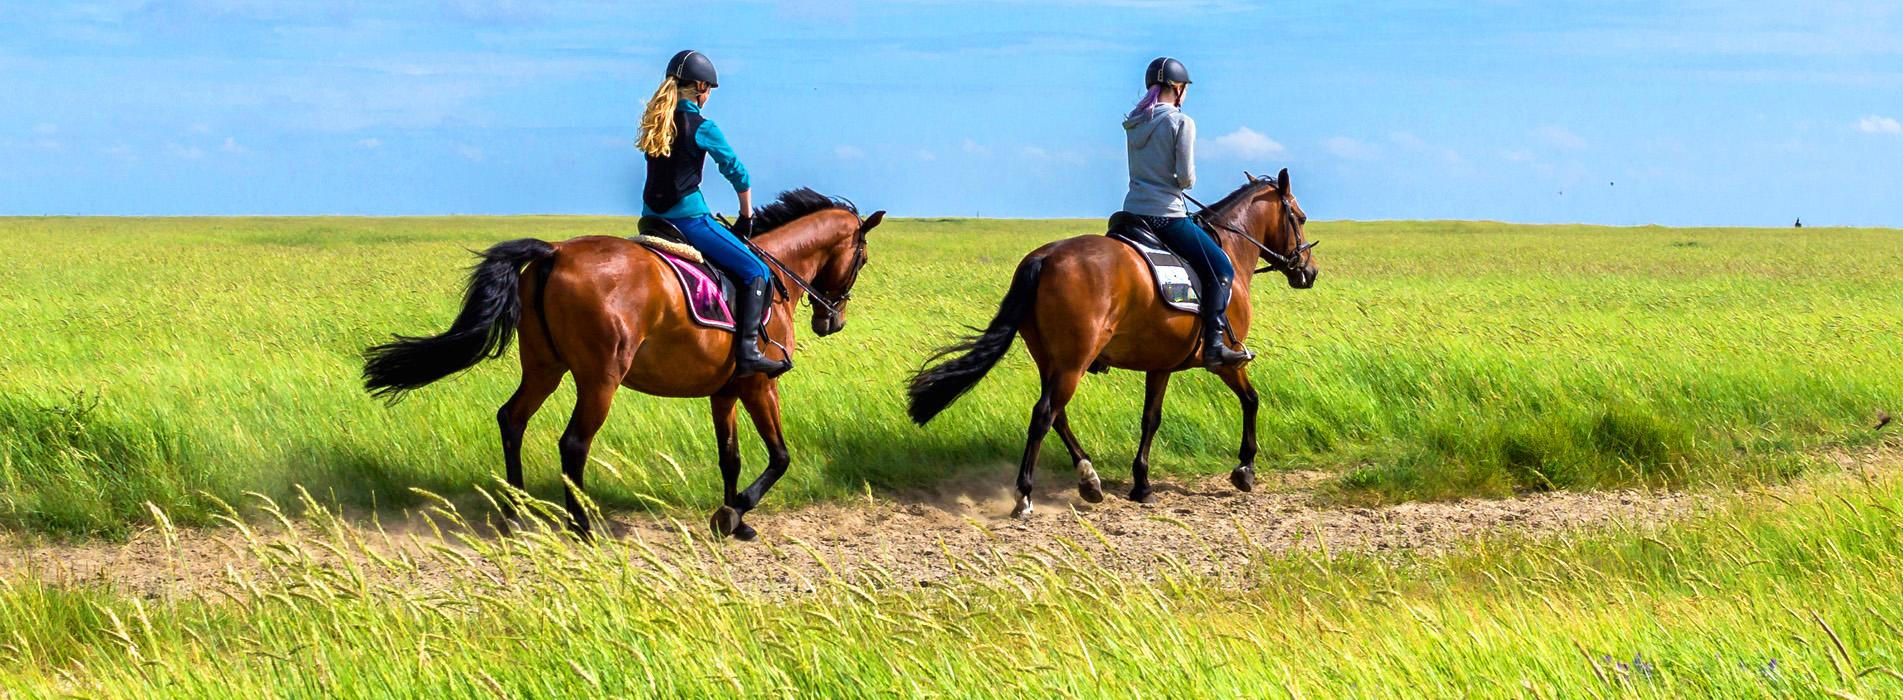 equestrian helmet wholesale